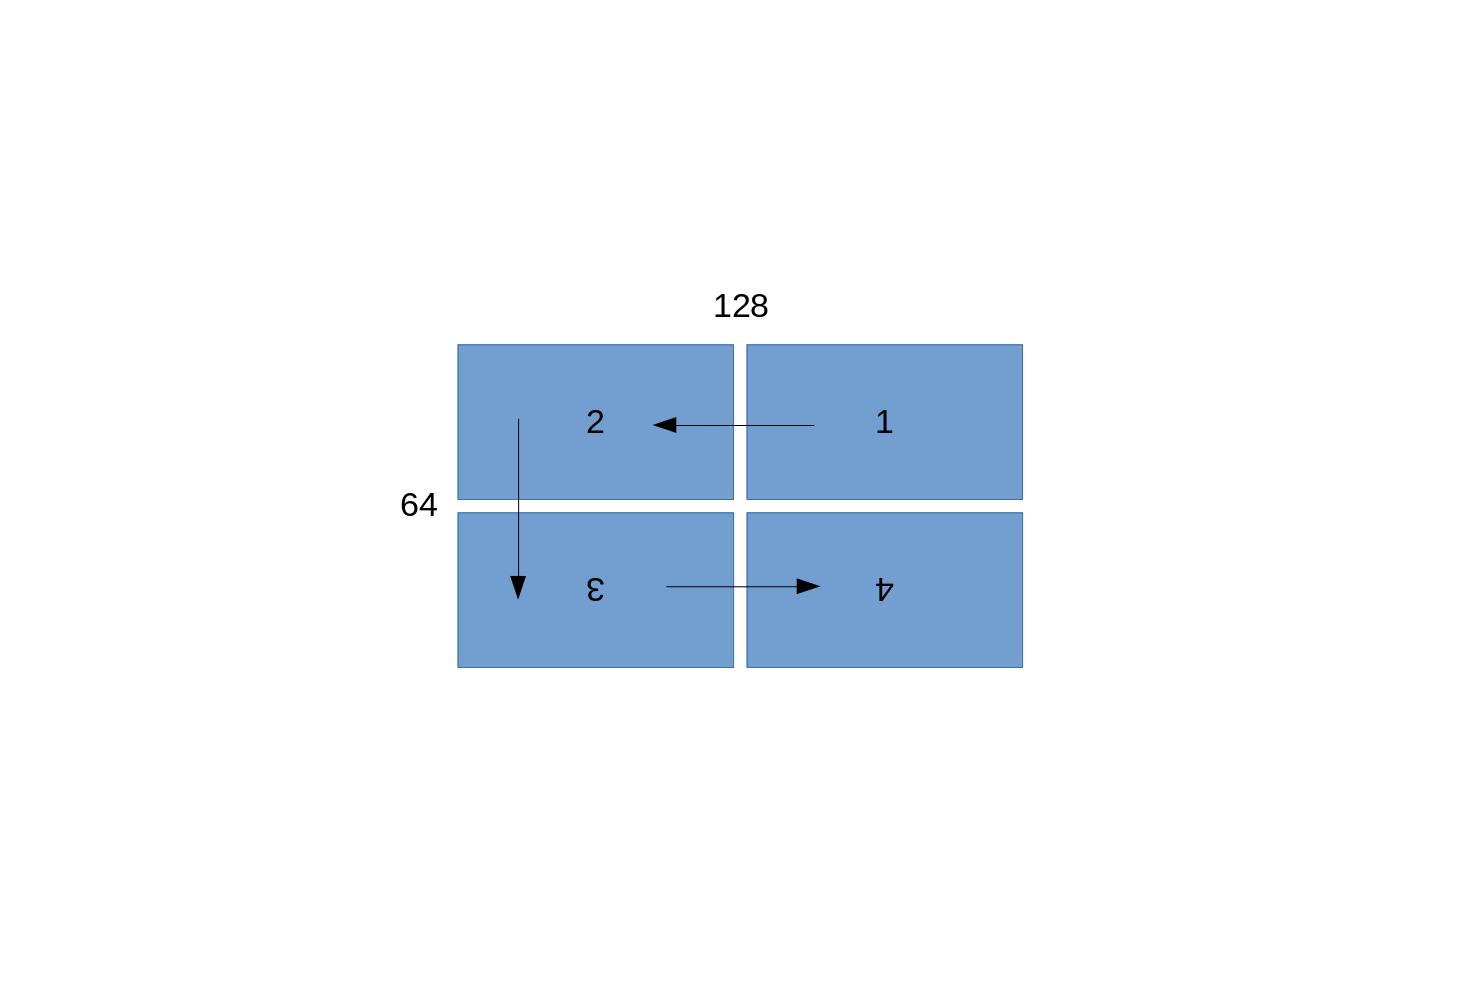 led_matrices_ksnip_20210128-112345.png